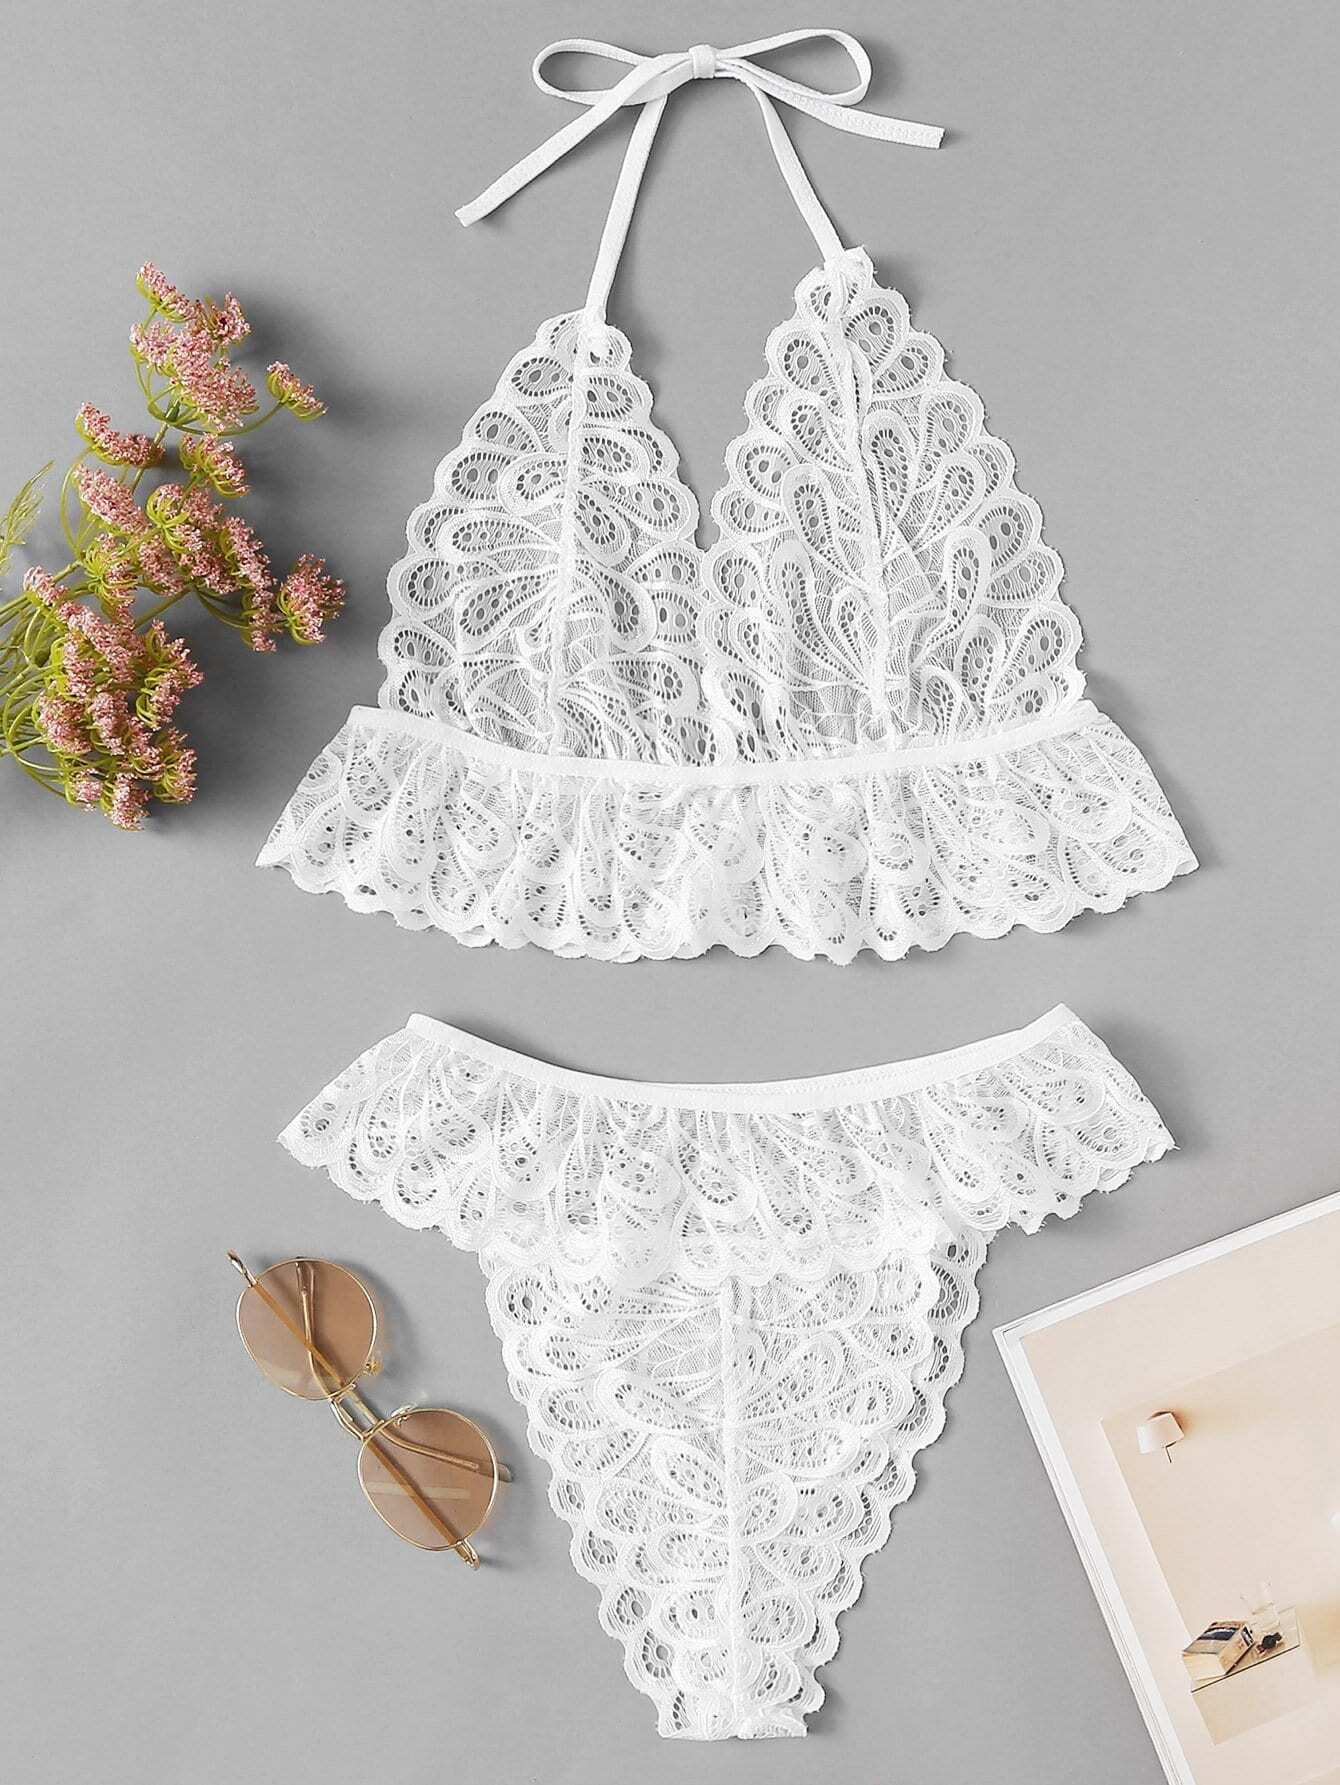 Scalloped Trim Lingerie Set bow detail scalloped trim lingerie set